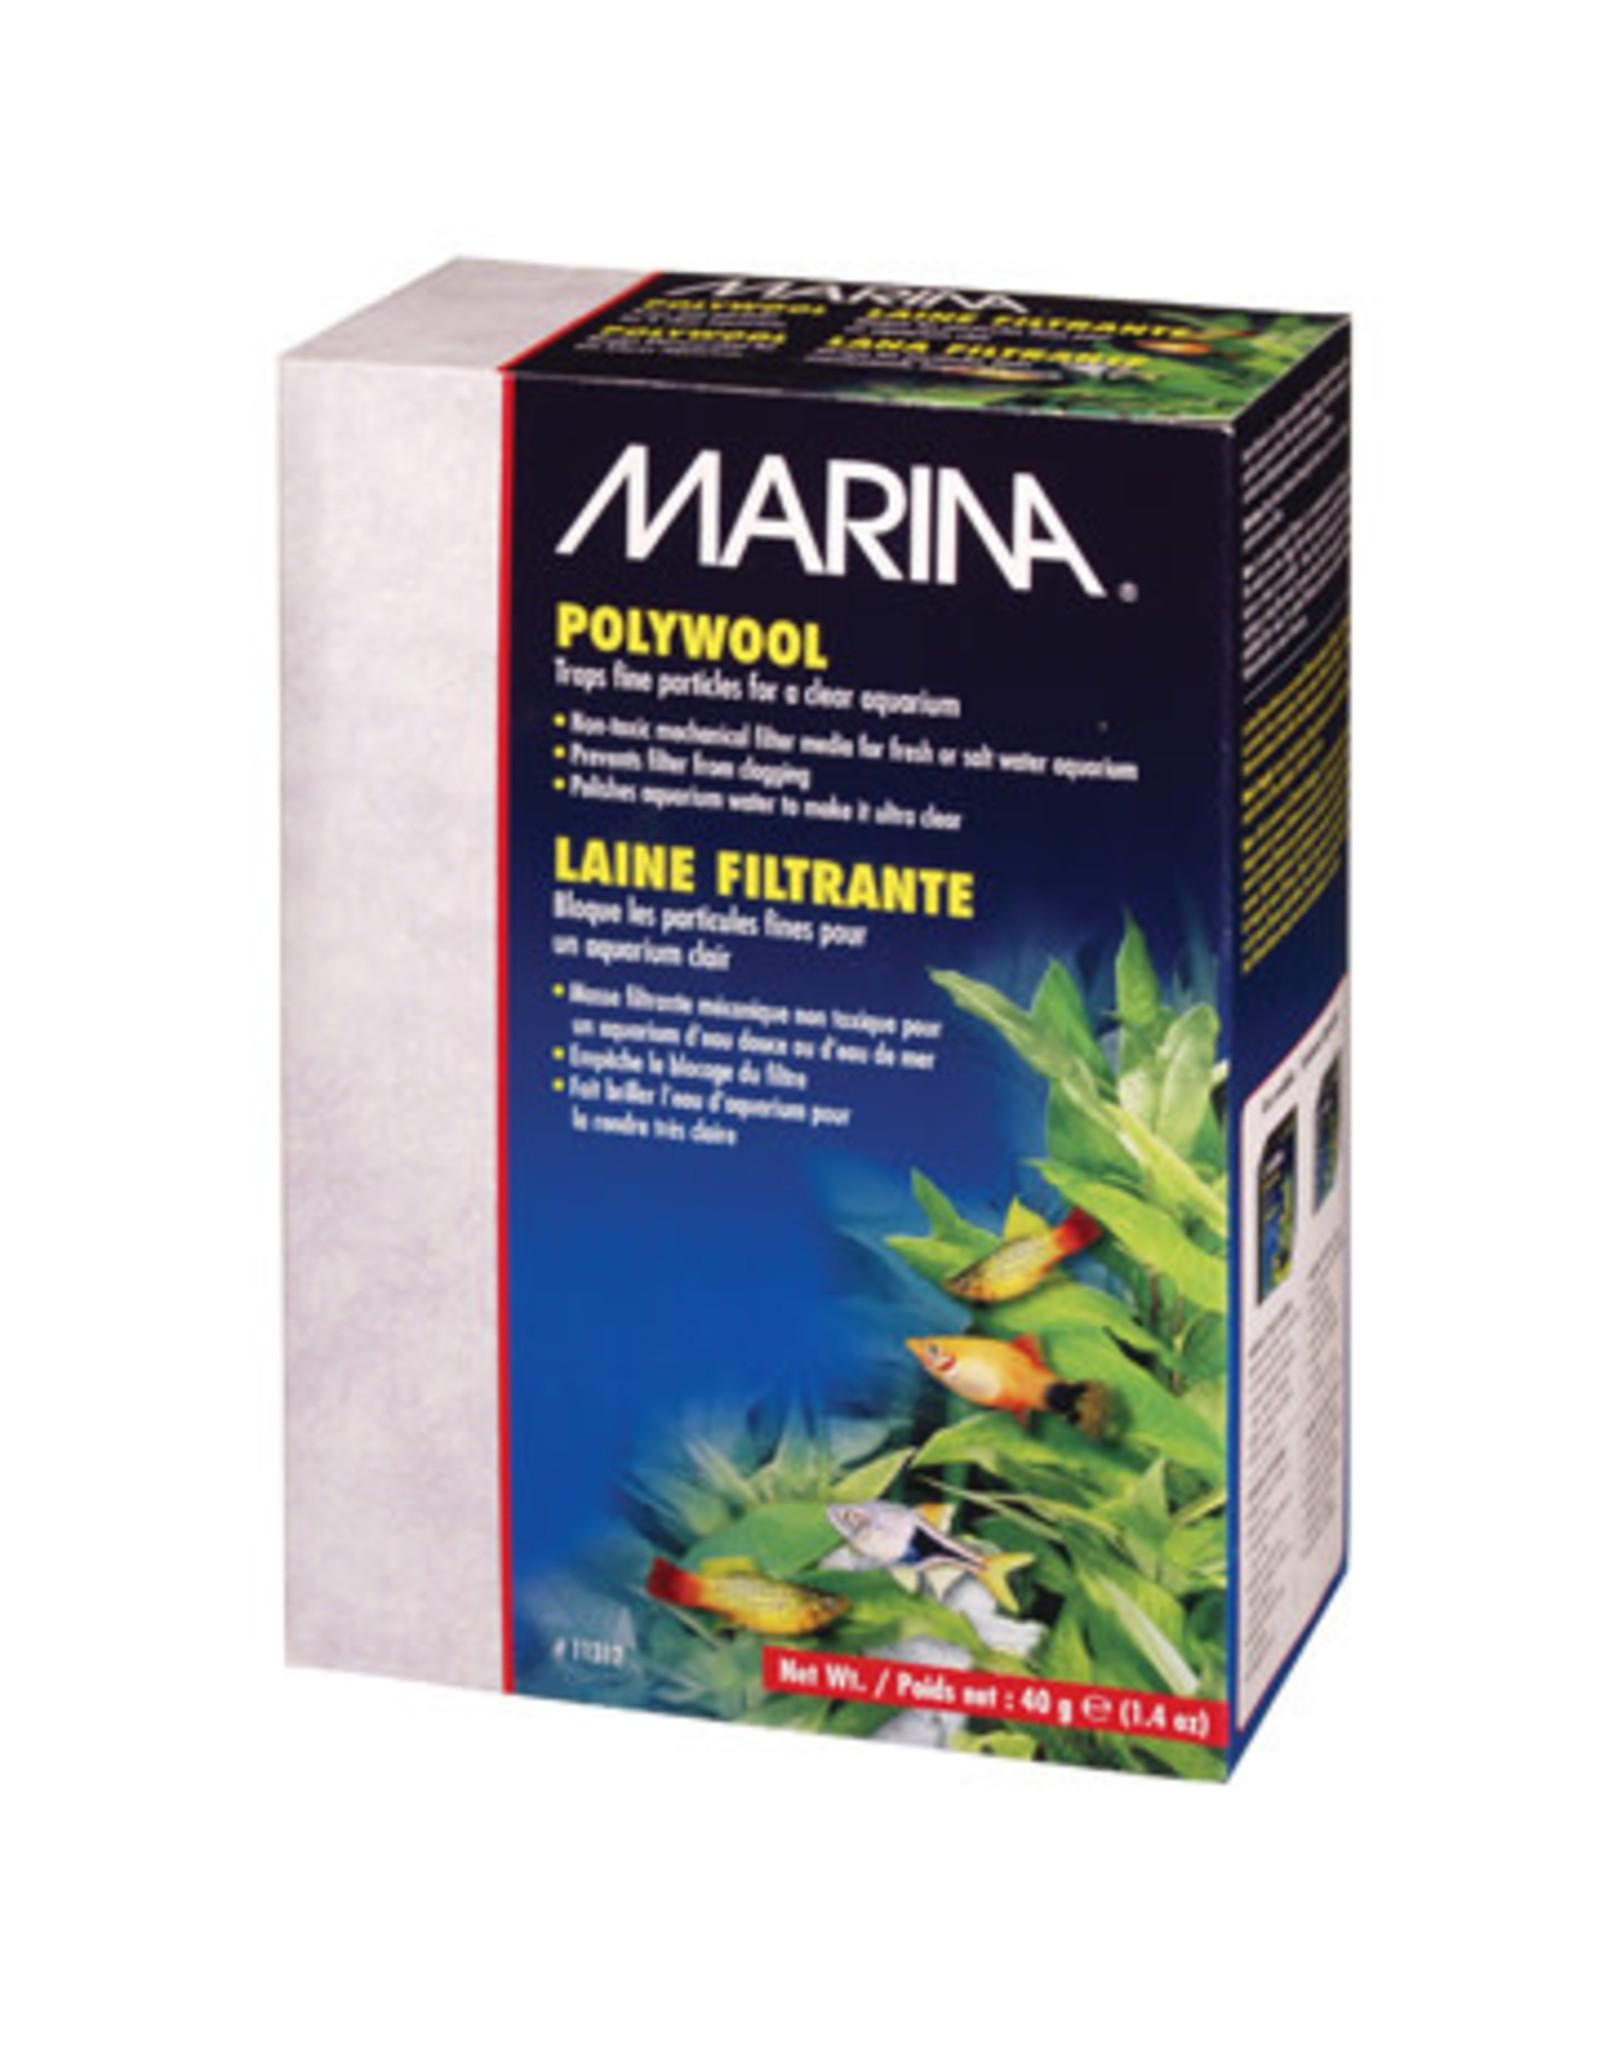 Marina Marina Polywool - 40 g (1.4 oz)